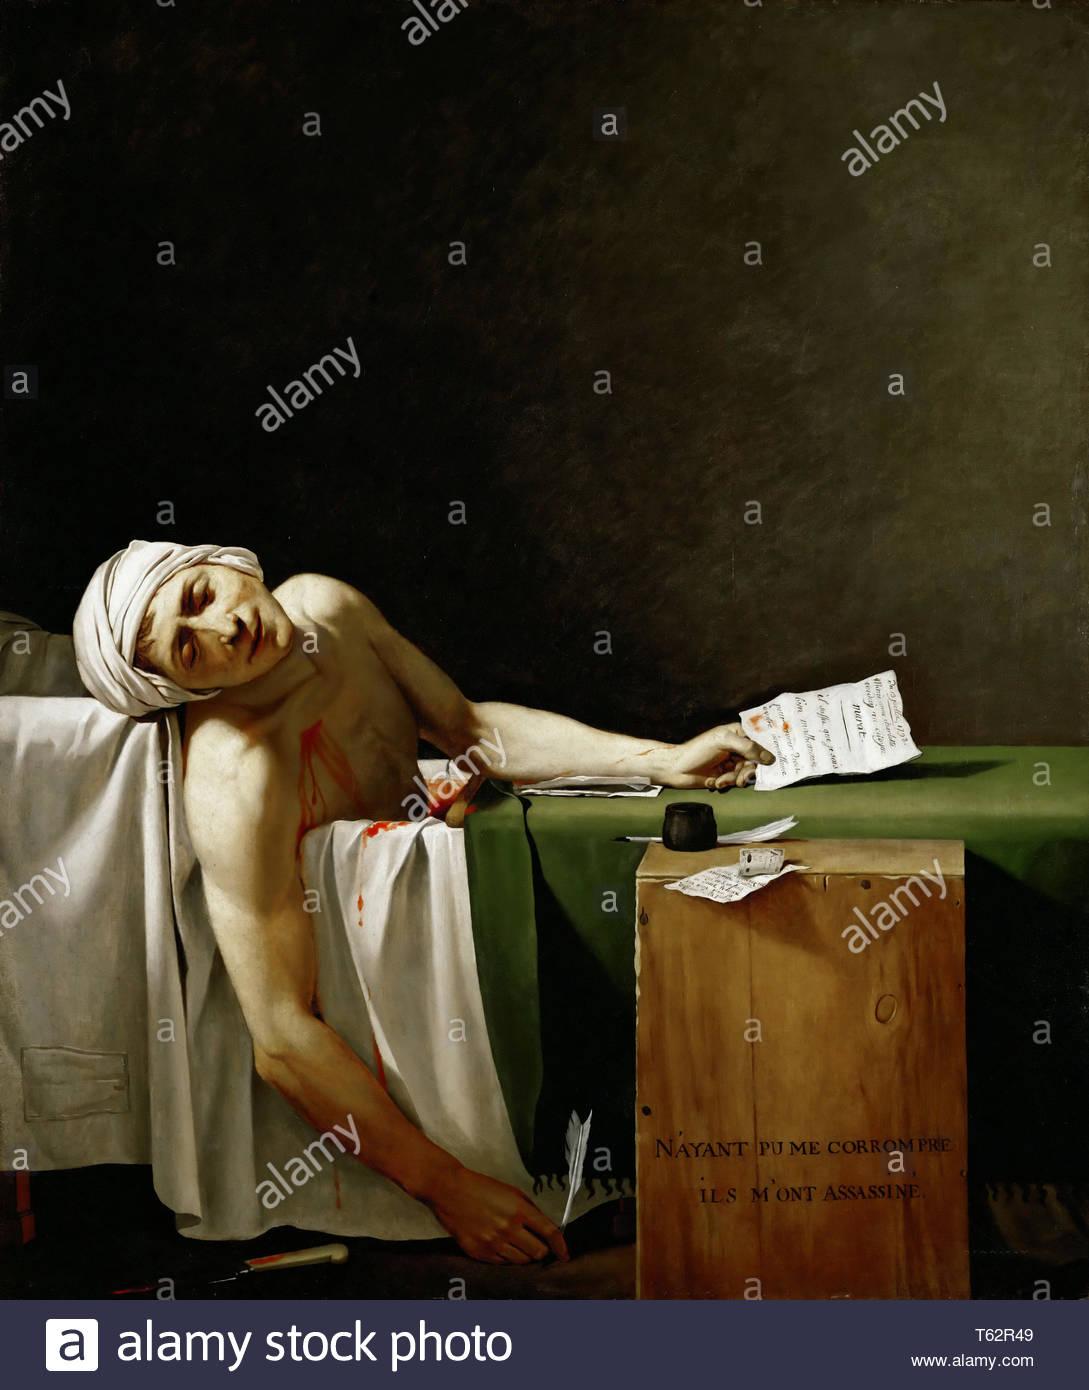 David, Jacques Louis-Jean Paul Marat, politician and publicist, dead in his bathtub - Stock Image